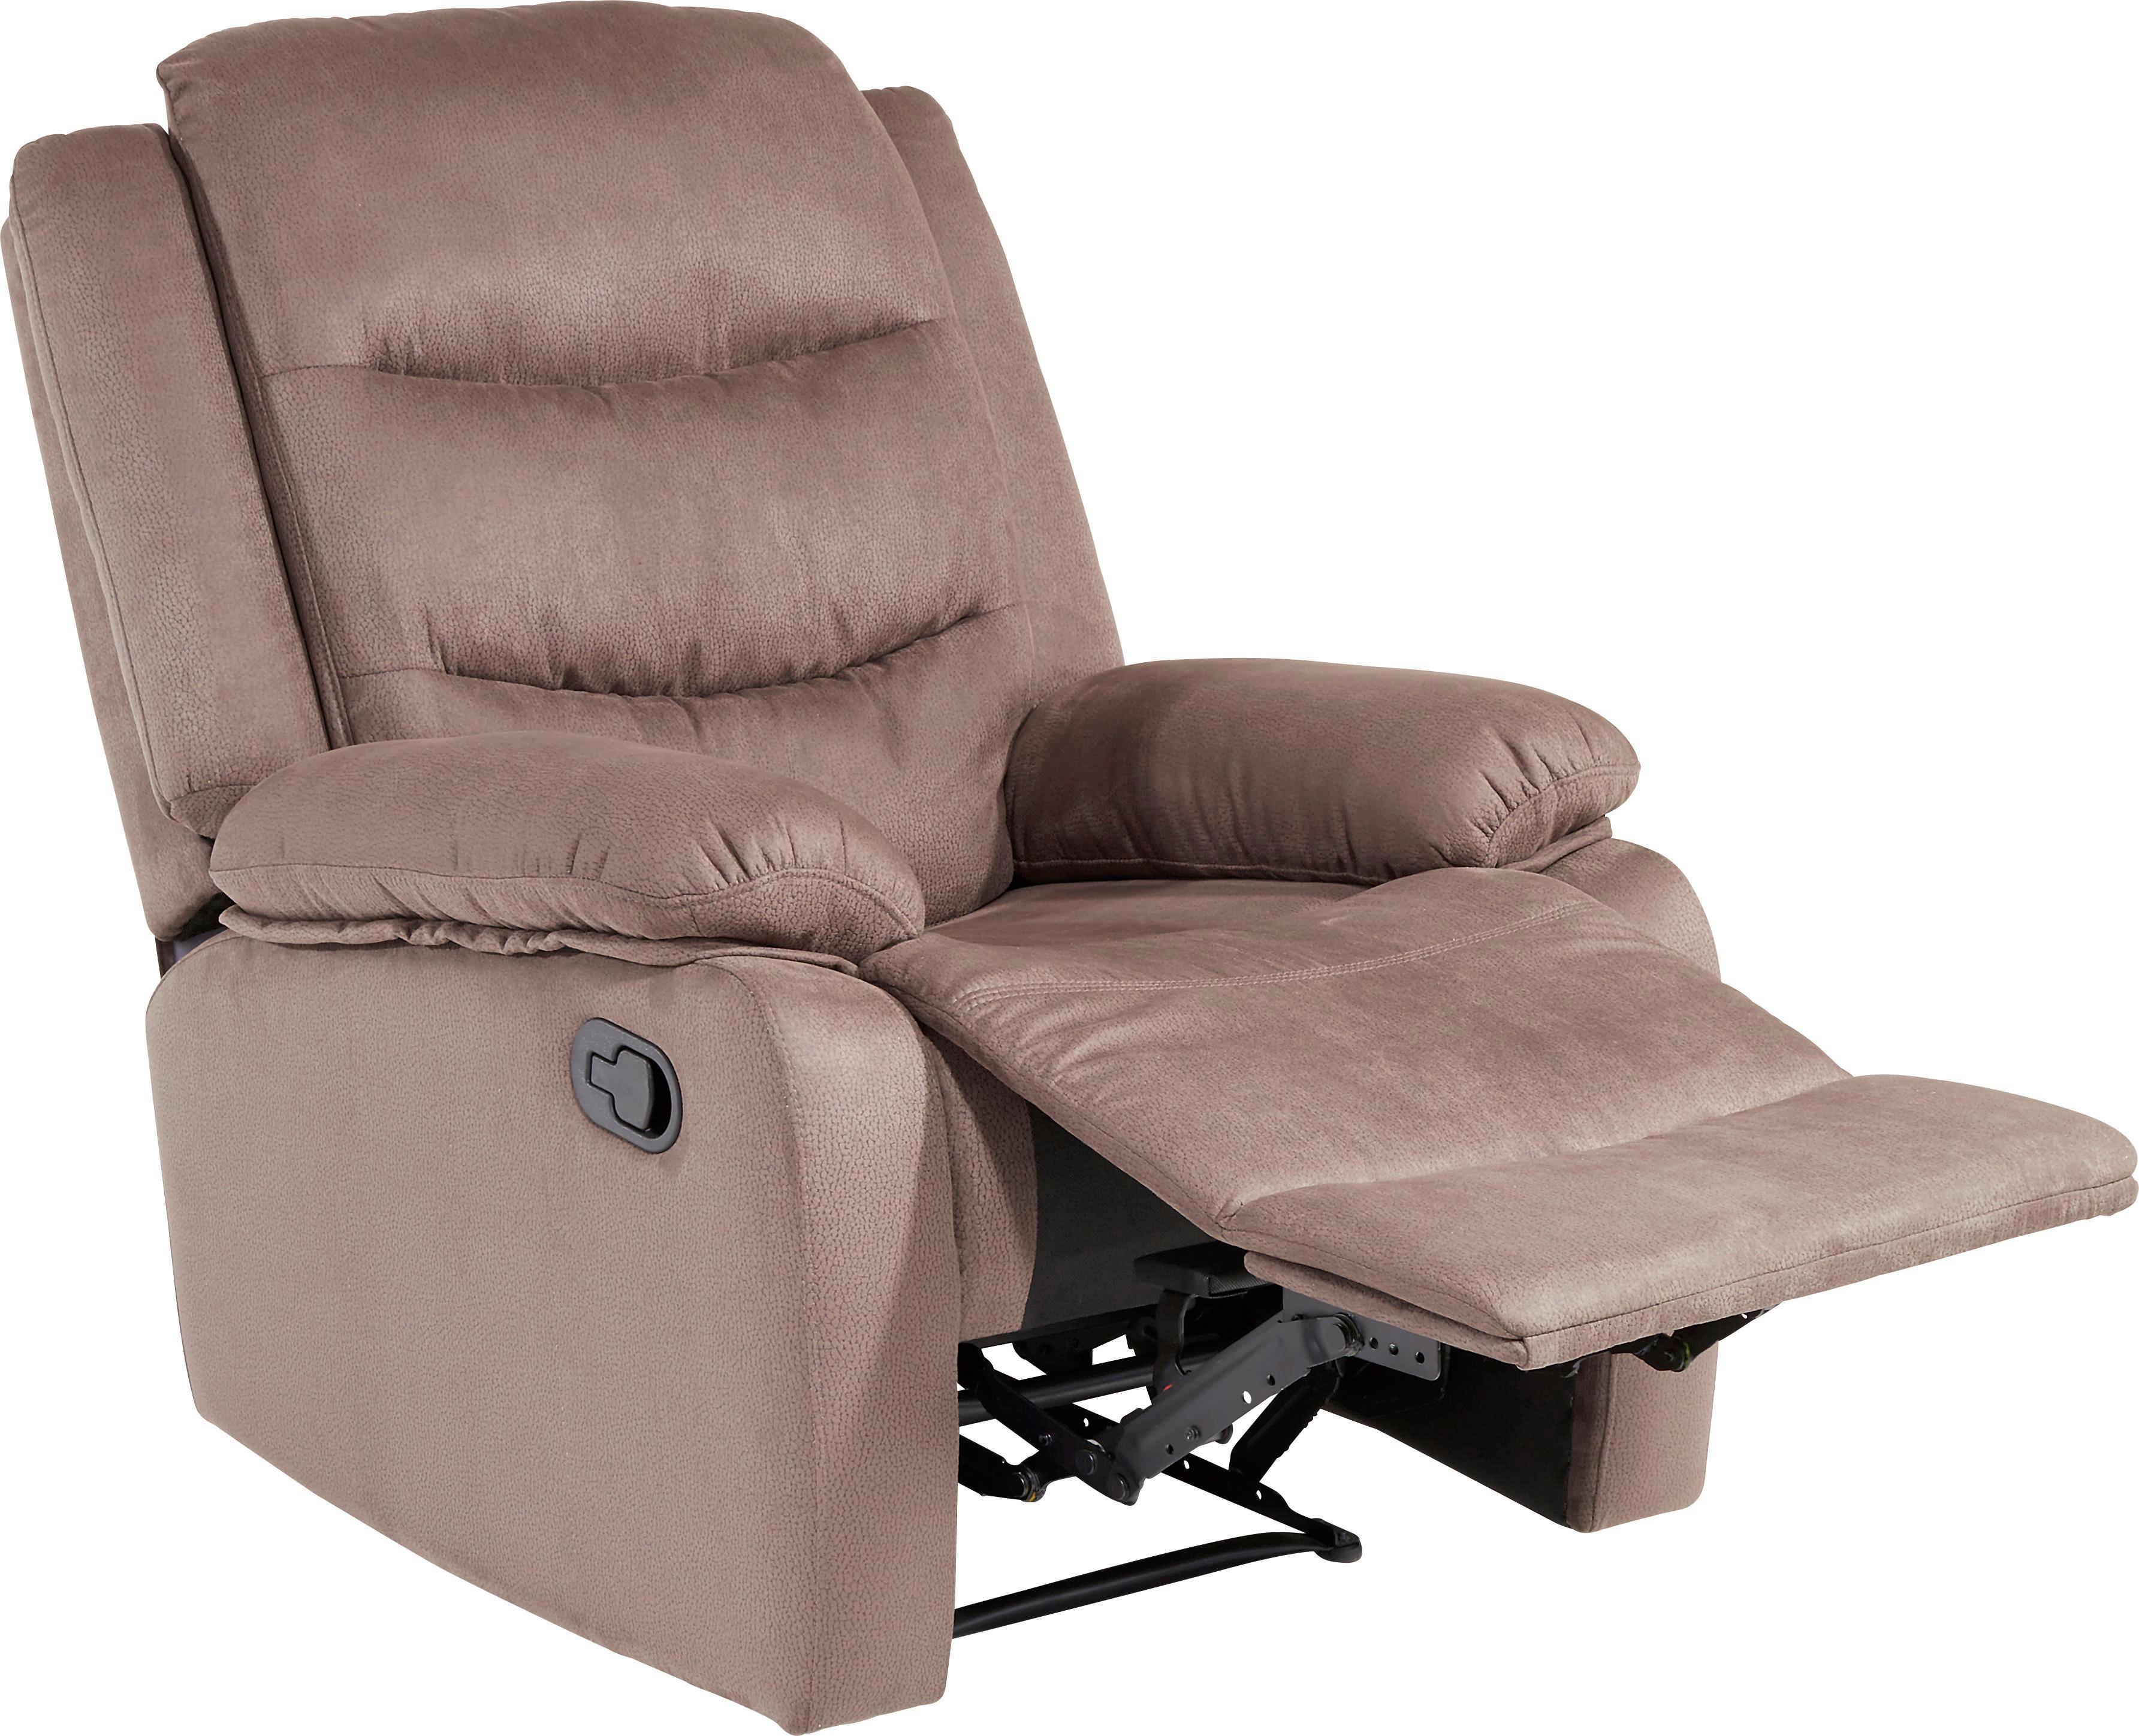 Tv-fotel Ivan - barna, konvencionális, műanyag/textil (85/103-85/91-160cm) - JAMES WOOD